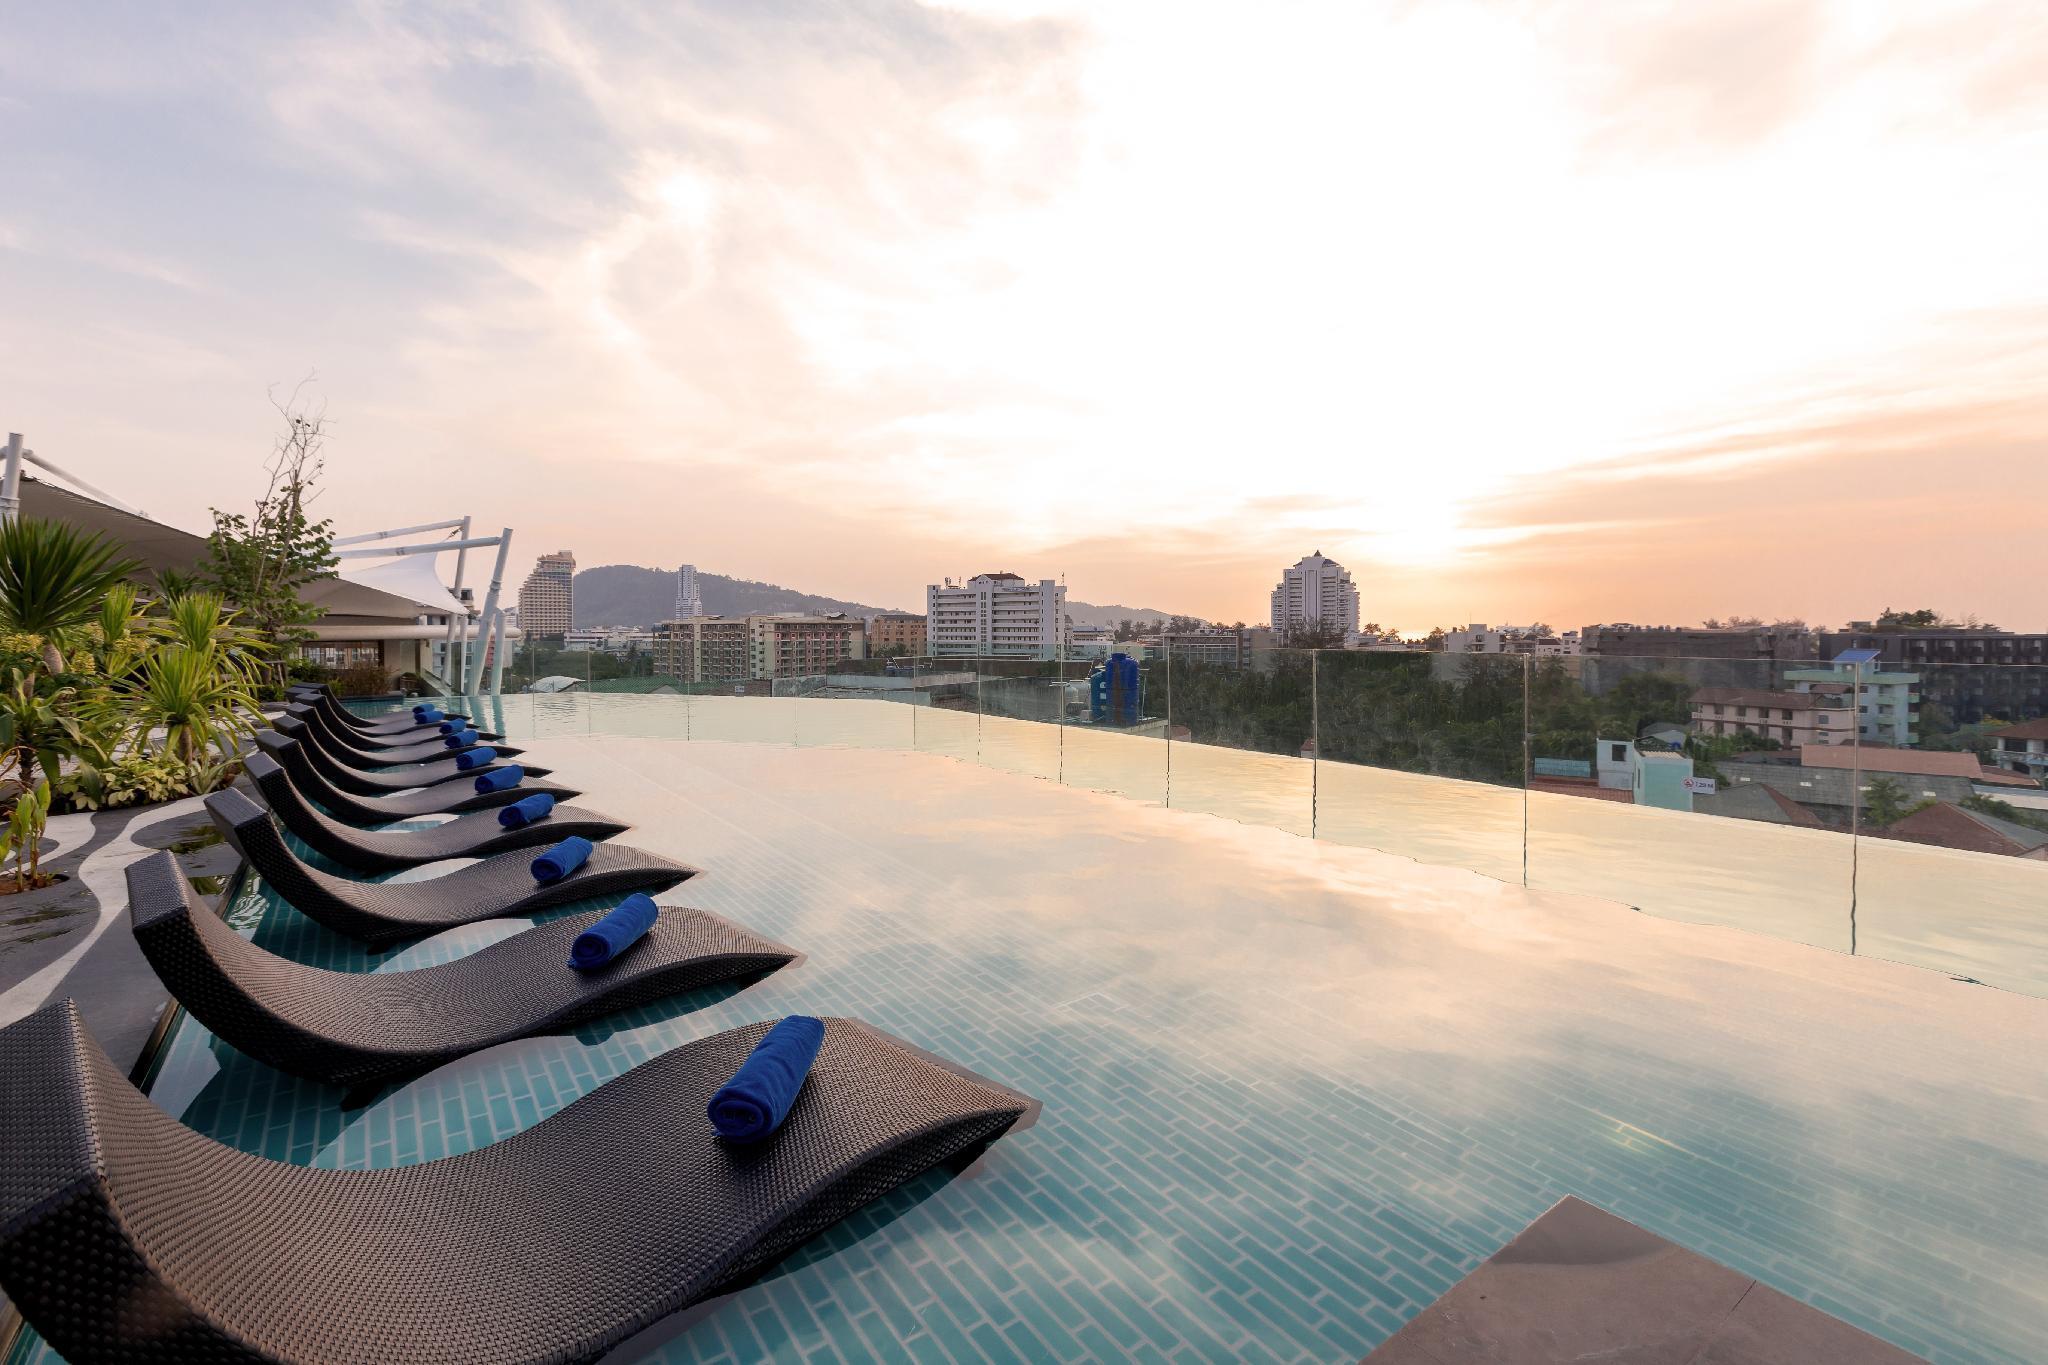 Oakwood Hotel Journeyhub Phuket โอ๊ควูด โฮเต็ล เจอร์นีย์ฮับ ภูเก็ต